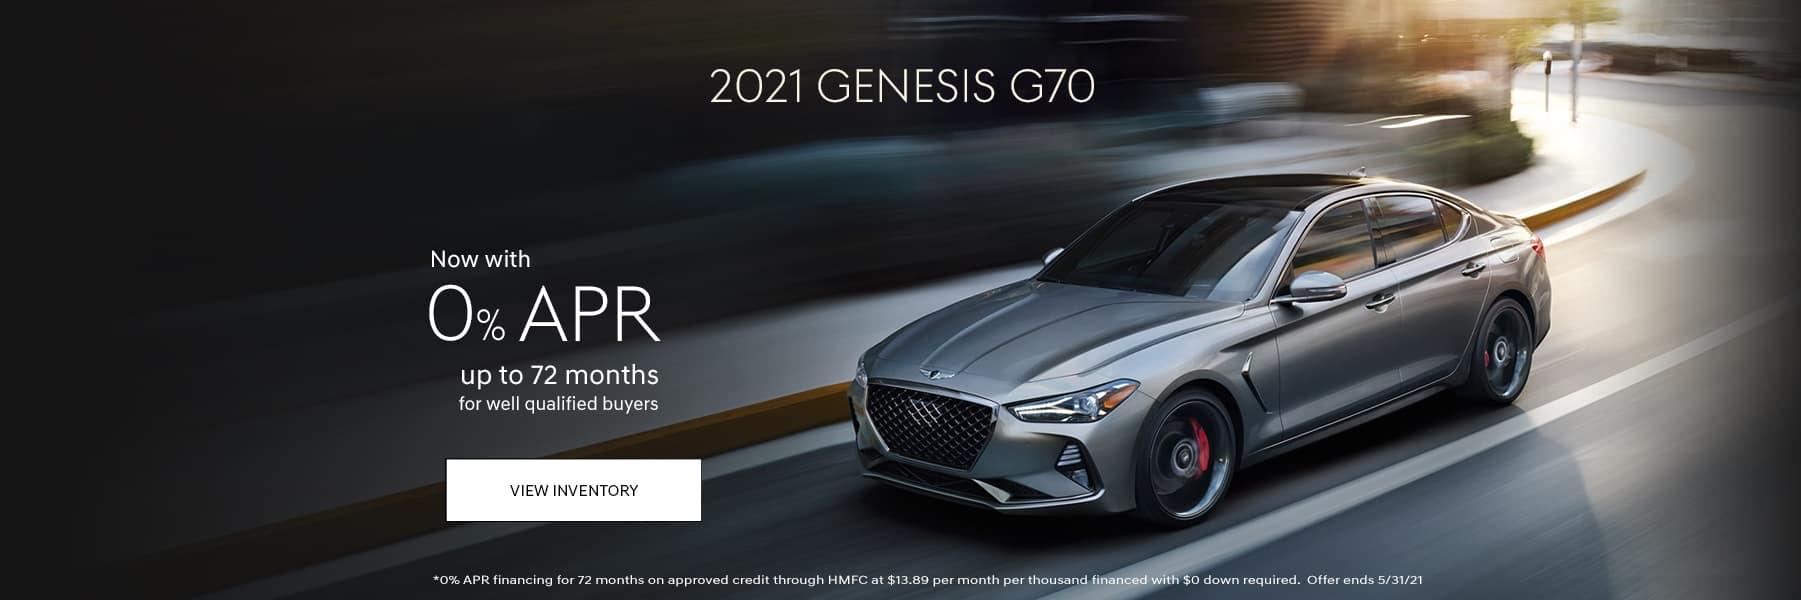 2021-Genesis-G70-May21